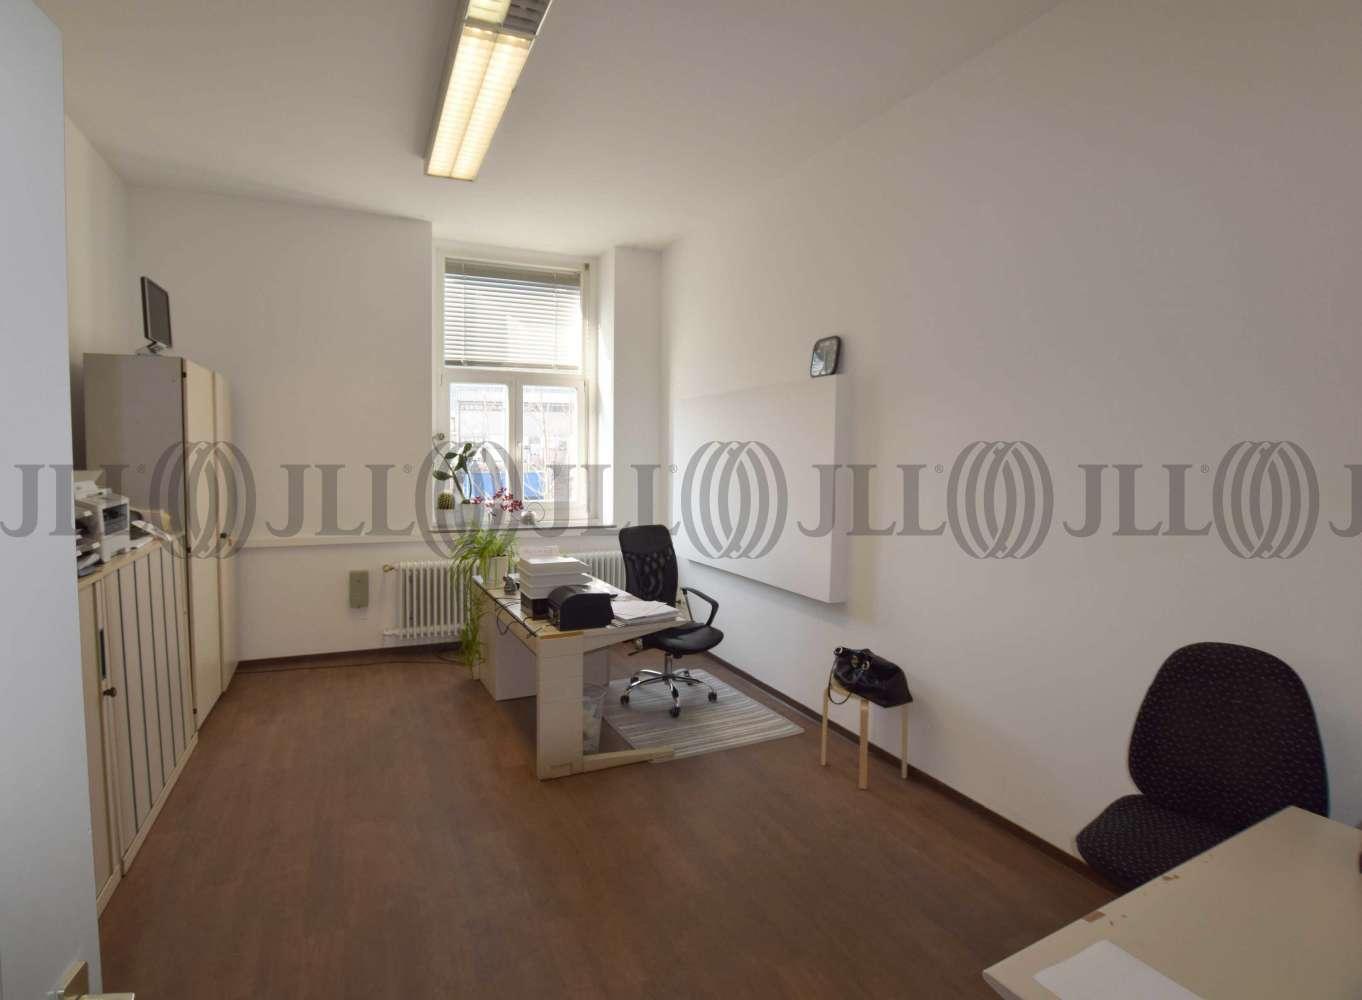 Büros Nürnberg, 90482 - Büro - Nürnberg - M1416 - 9416760